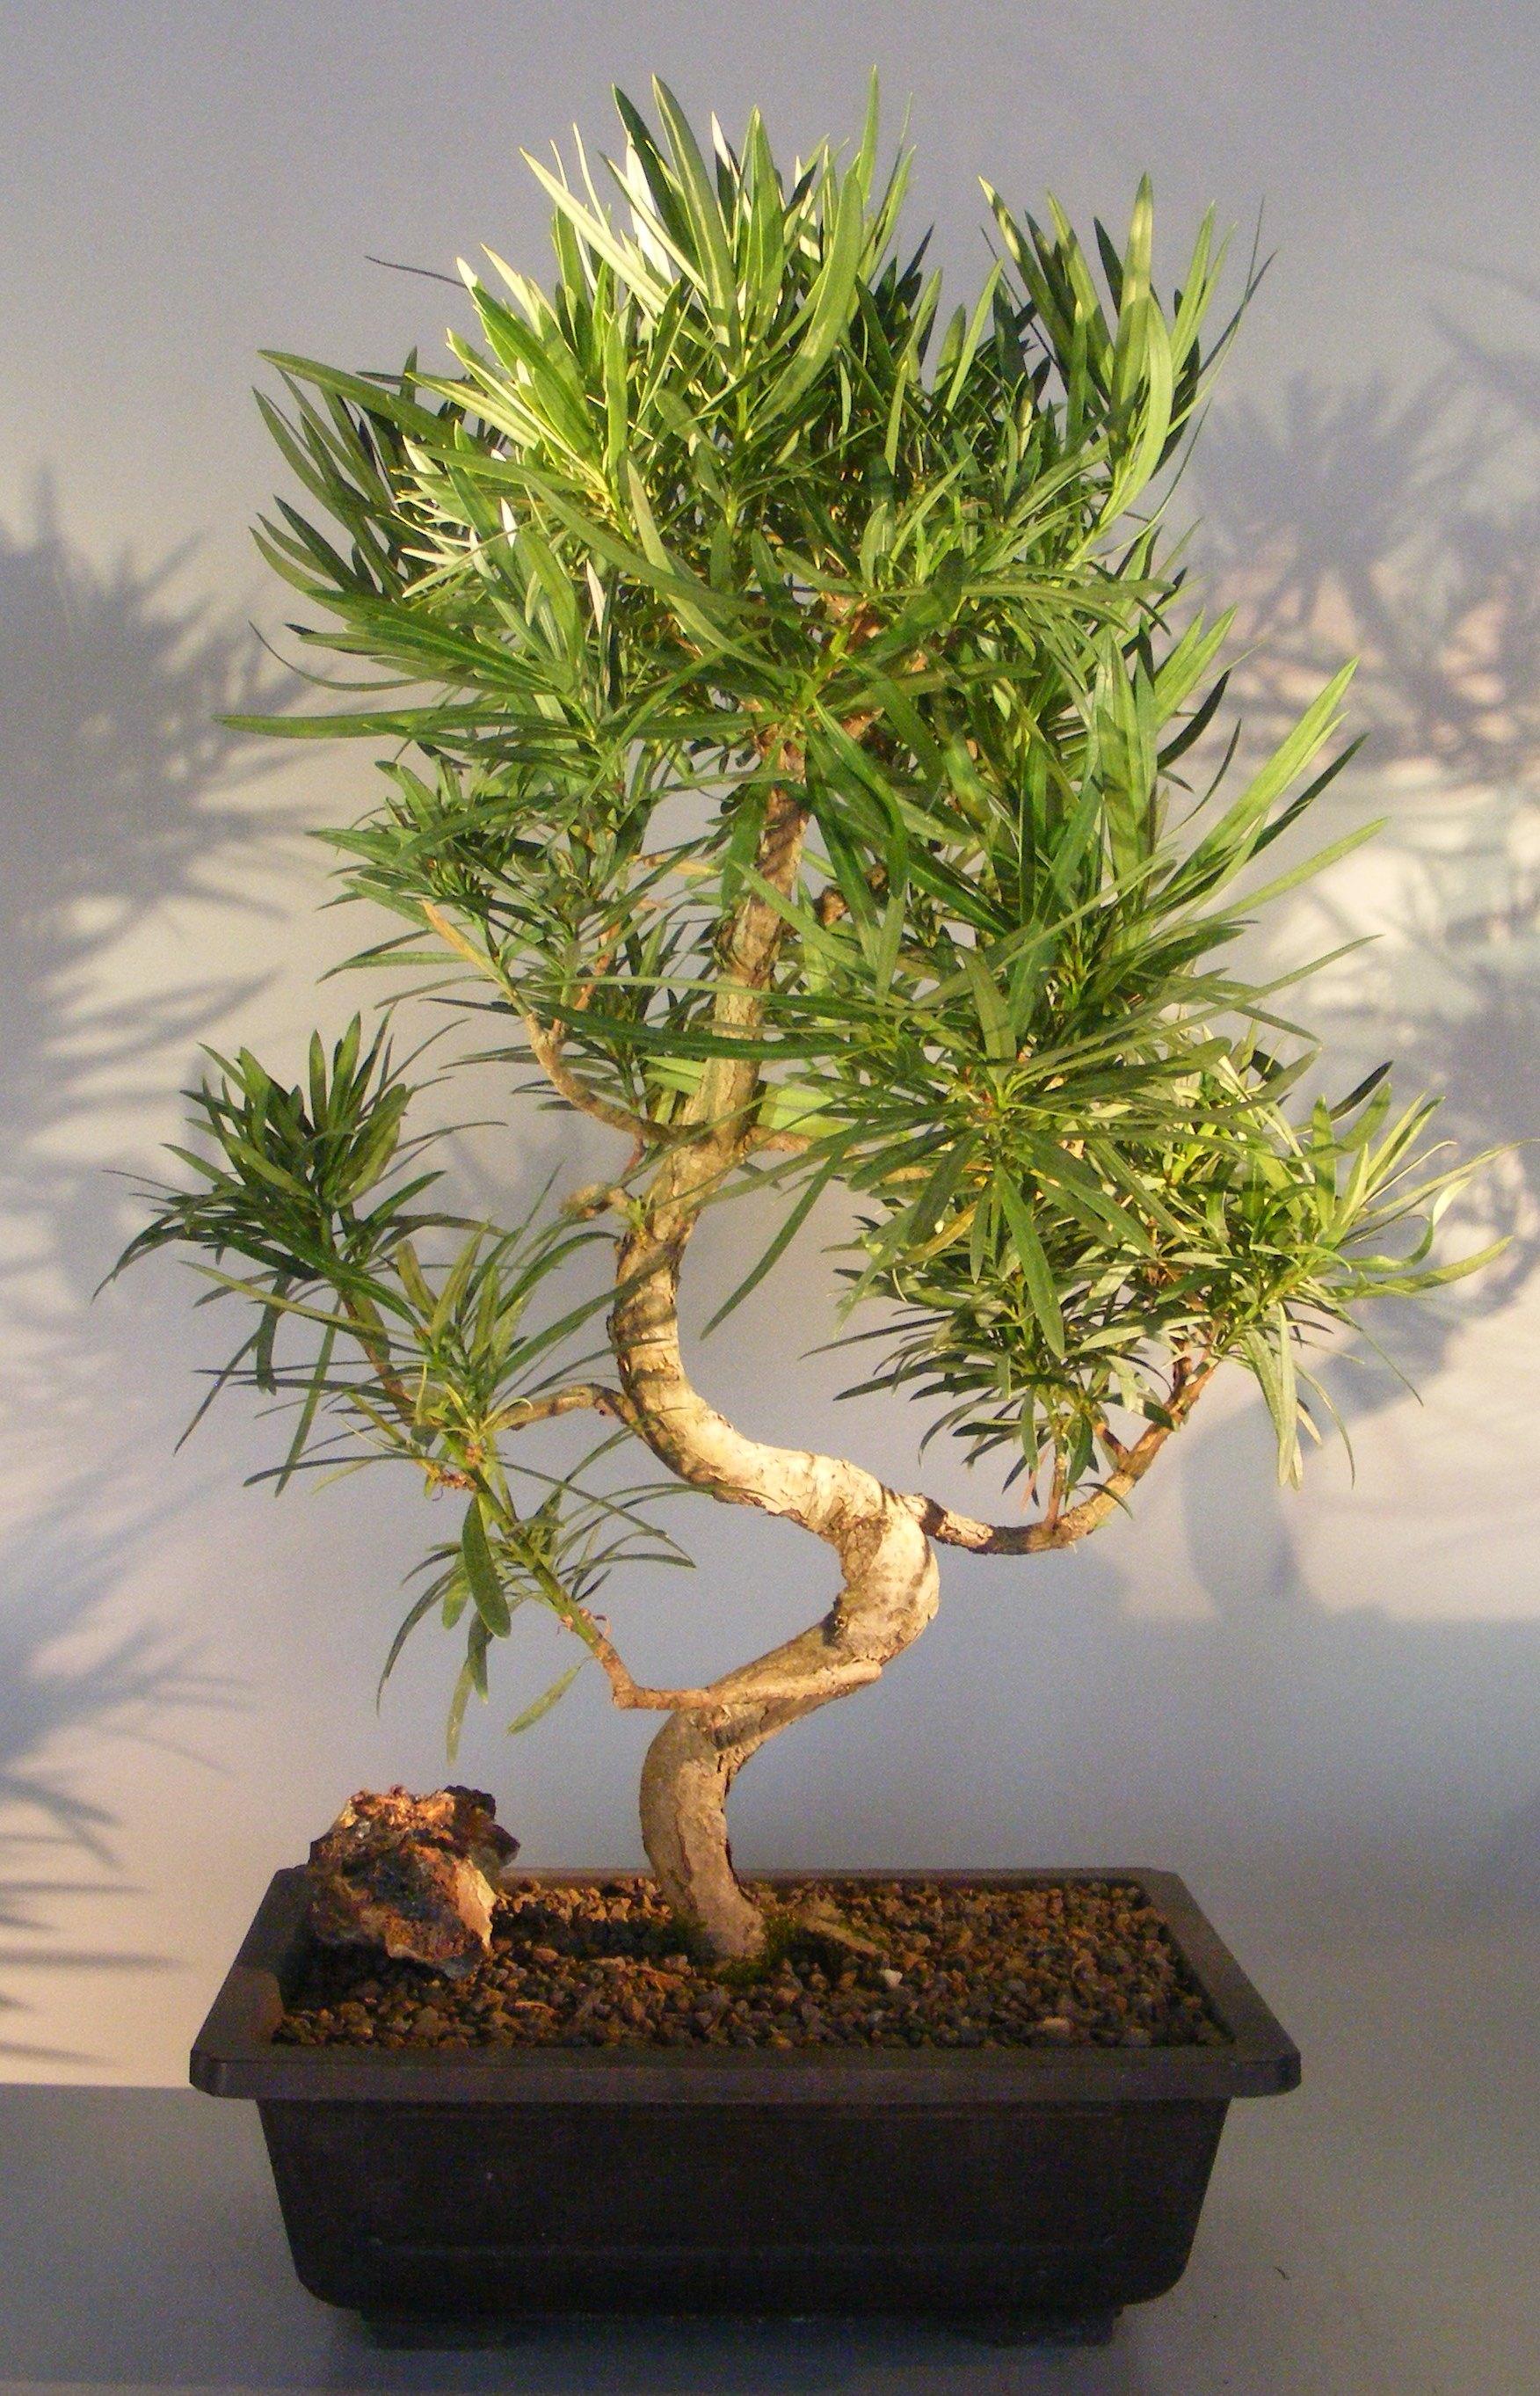 Flowering Podocarpus Bonsai Tree Curved Trunk Style(podocarpus macrophyllus) Image